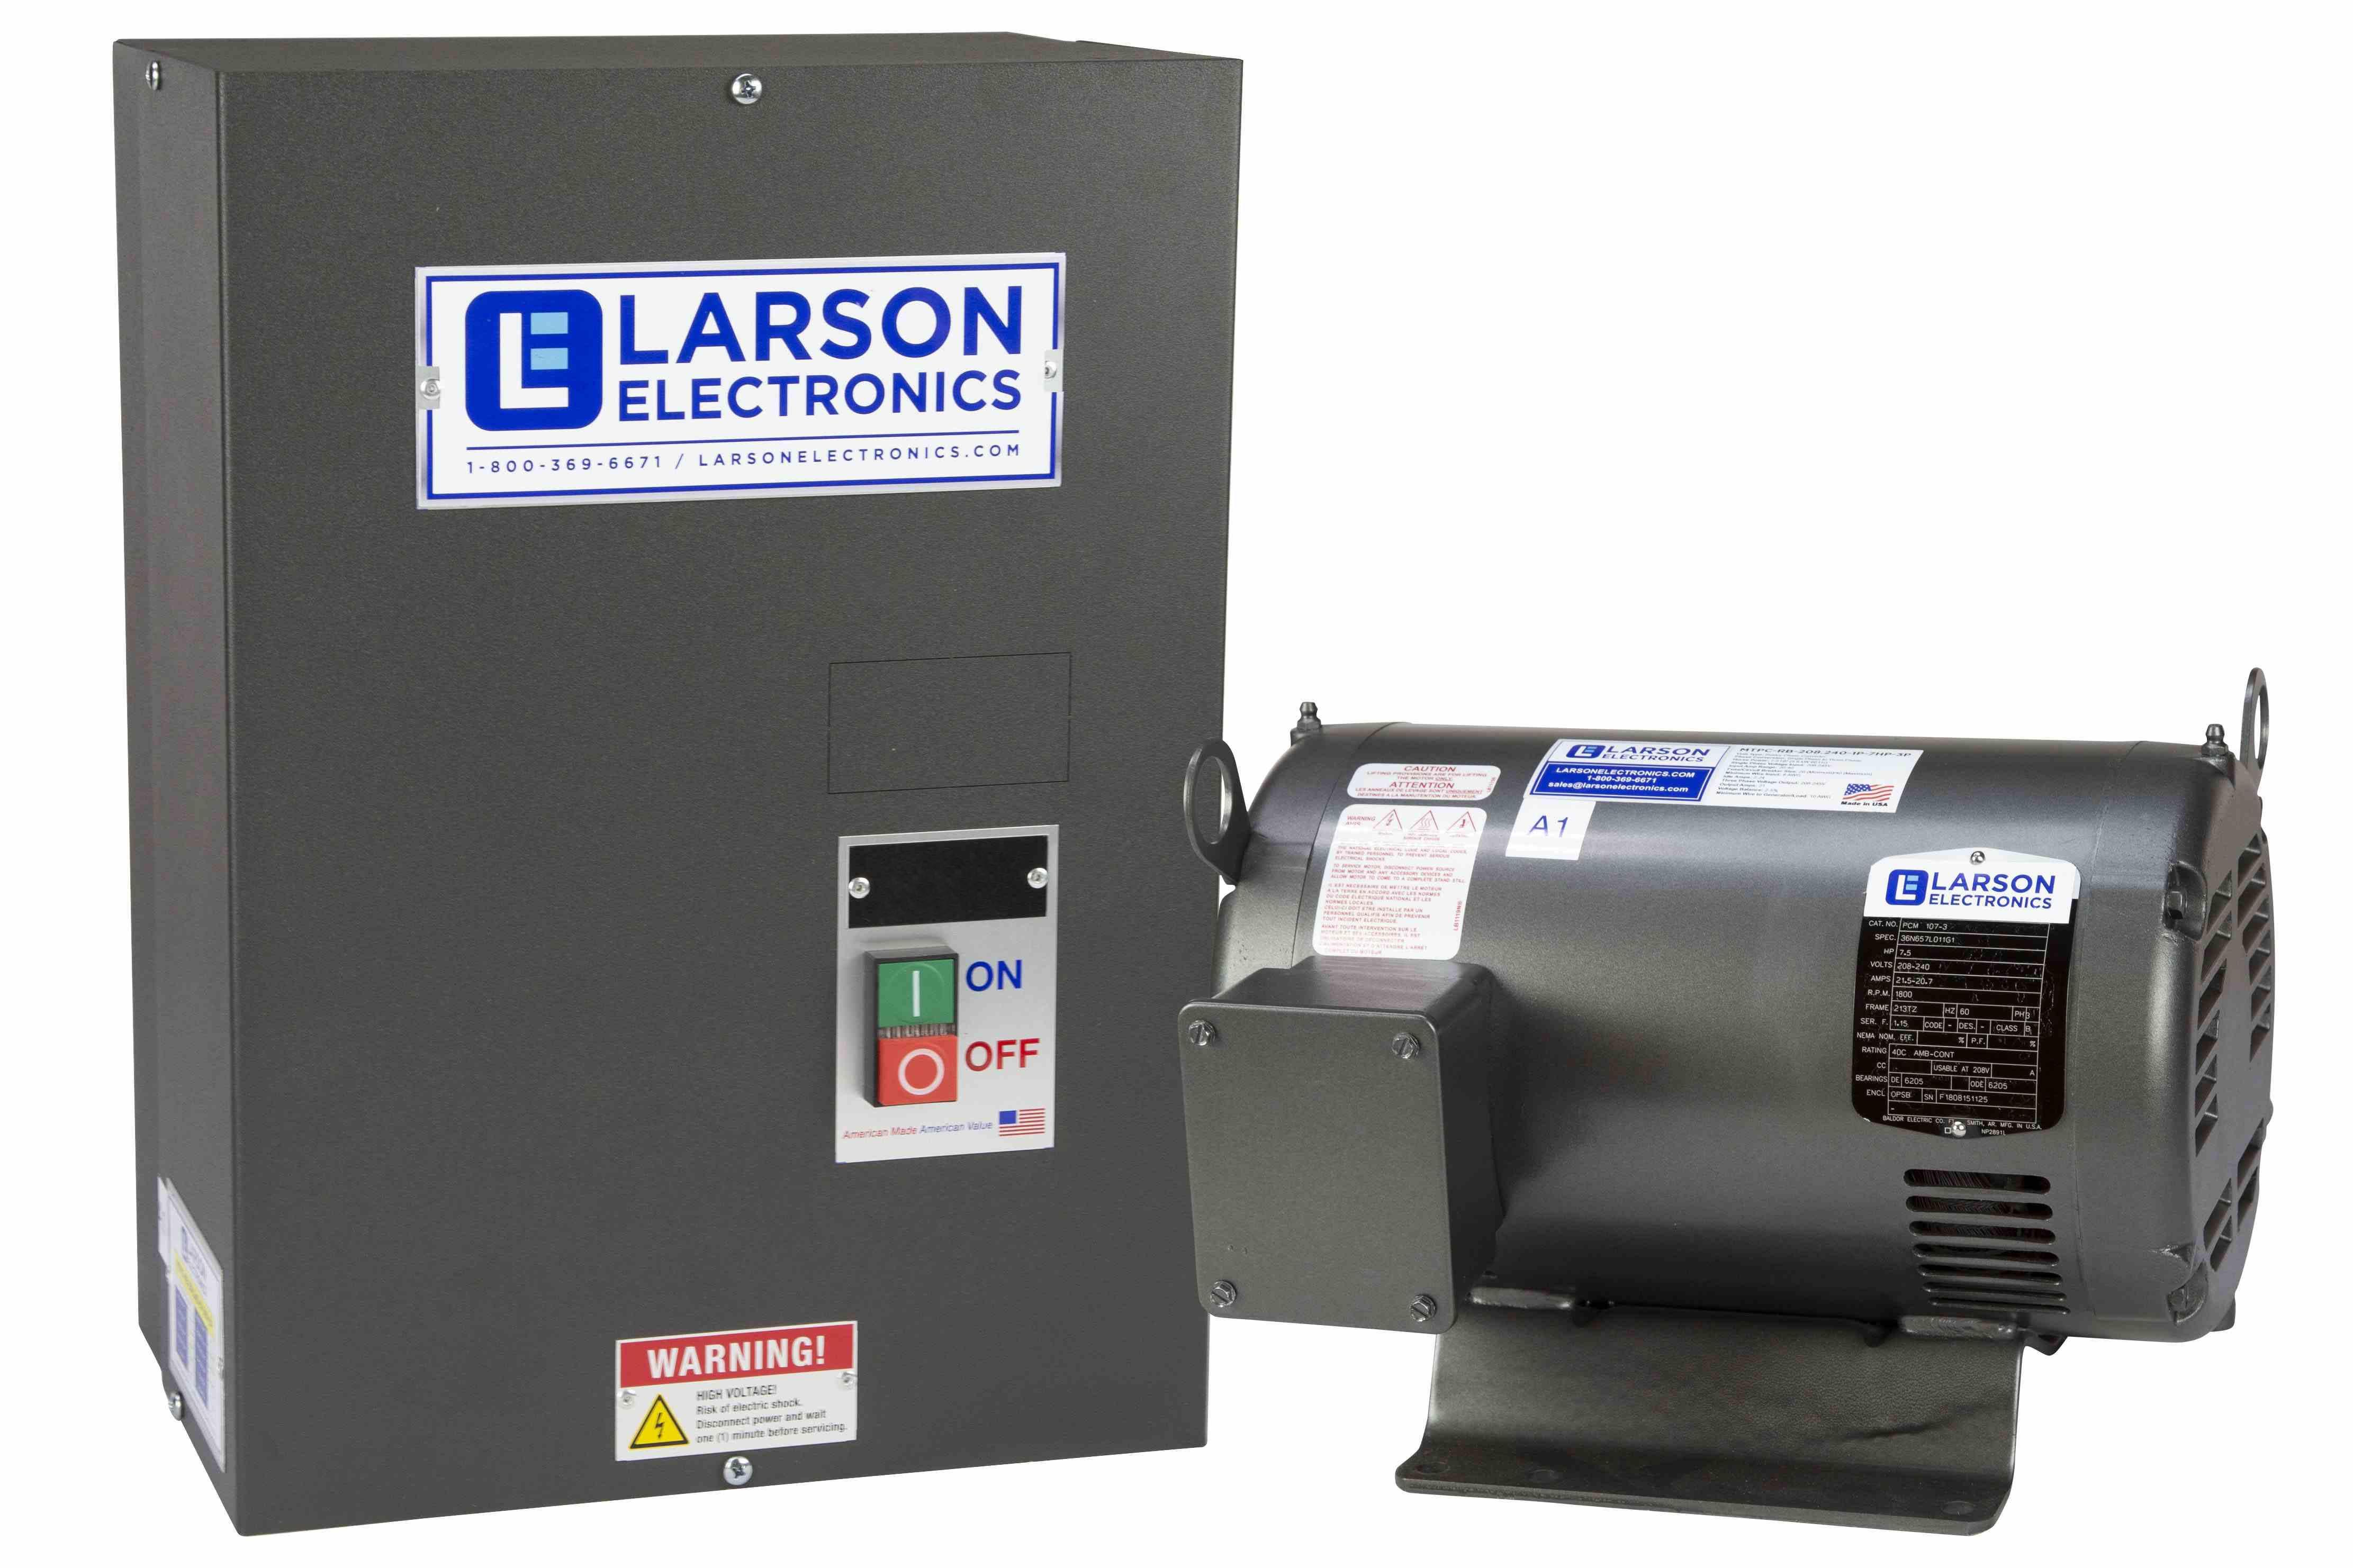 Rotary Phase Converter for 50HP Medium Loads, 230V 1PH to 3PH, 136 Amps Output, 75HP Idler, NEMA 1